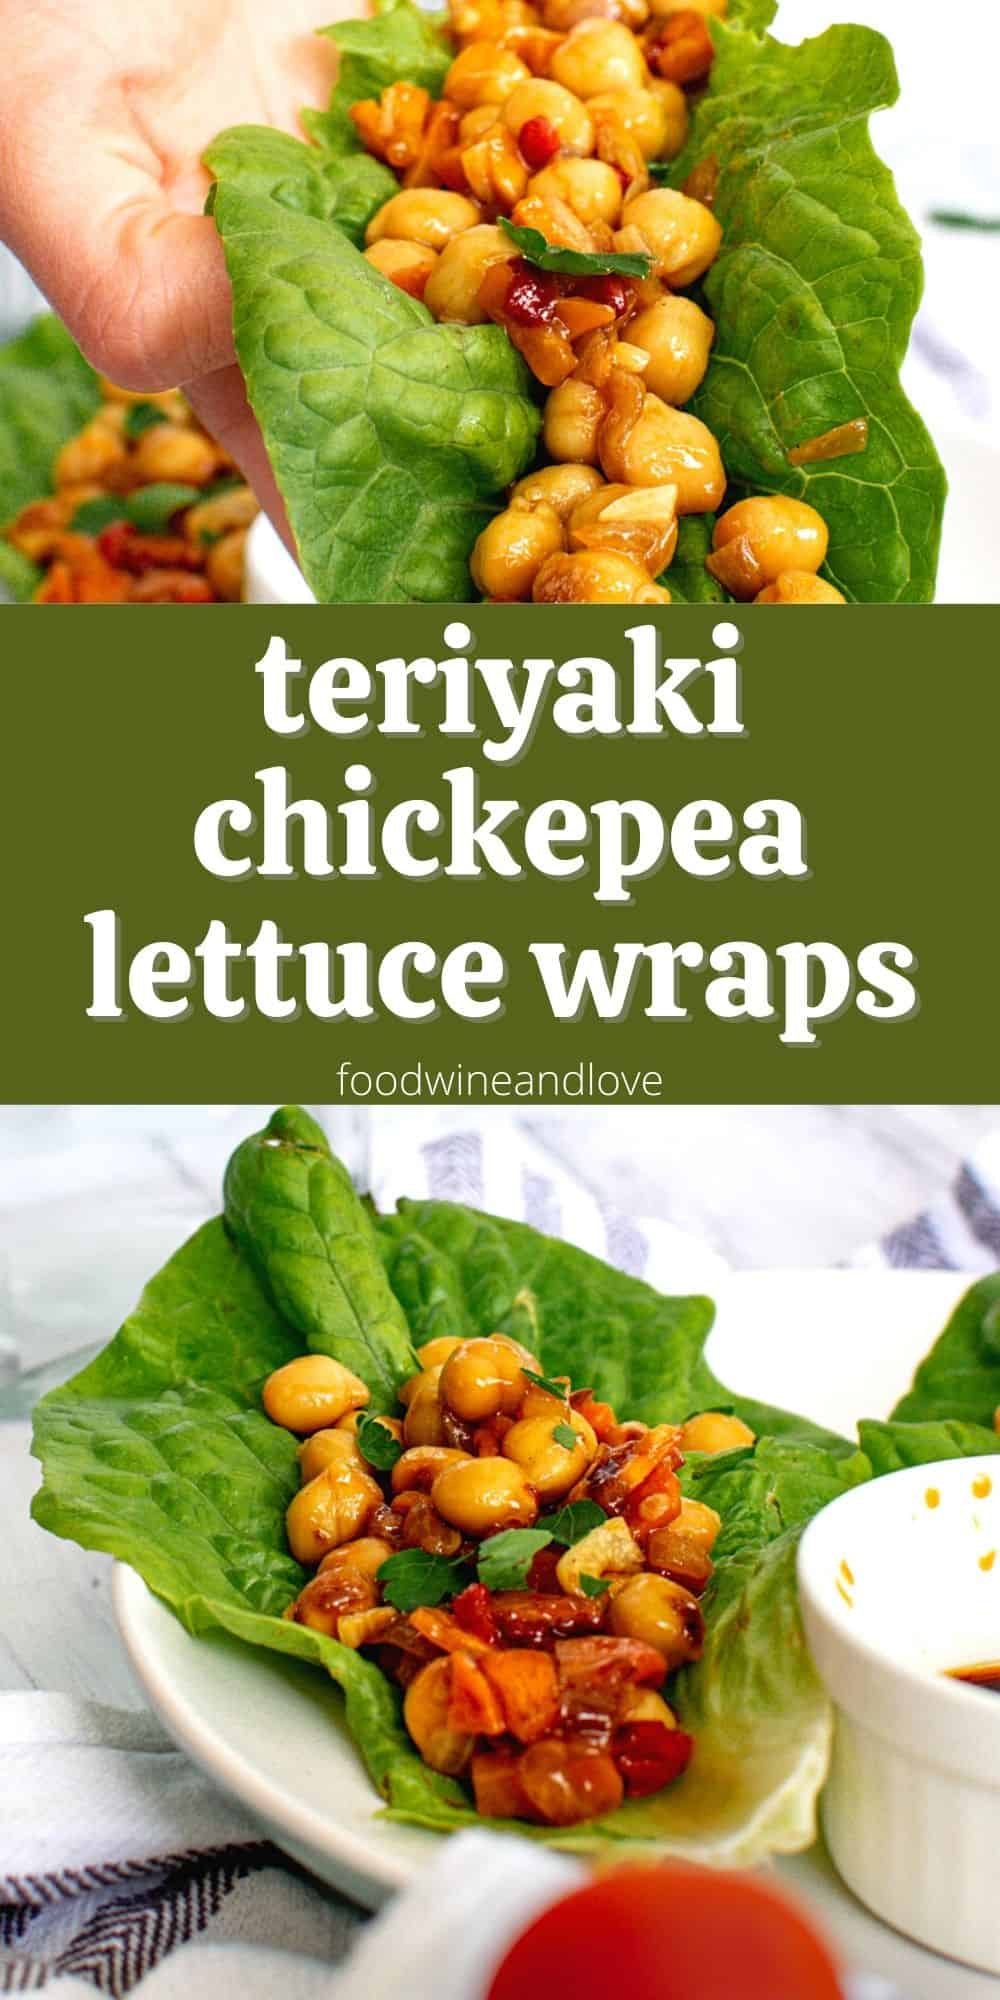 Teriyaki Chickpea Lettuce Wraps